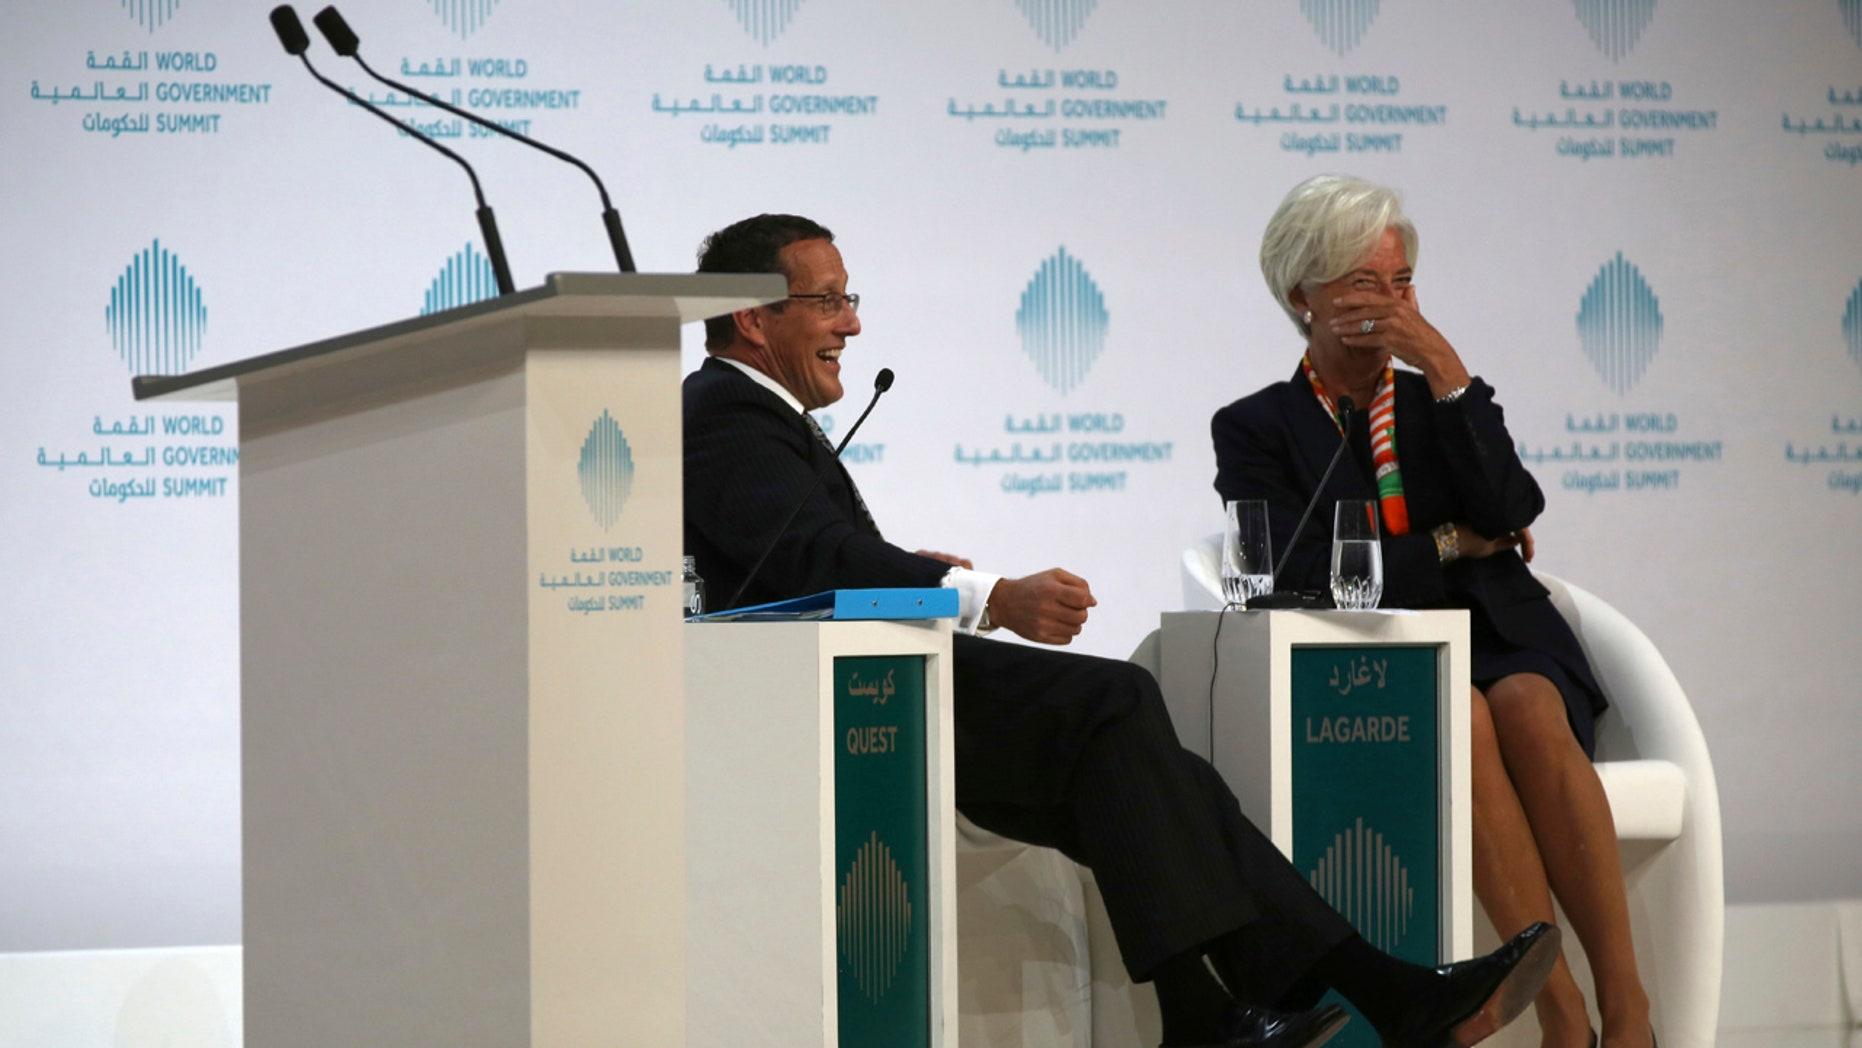 Christine Lagarde, managing director of the International Monetary Fund, reacts to a joke by Richard Quest of CNN in Dubai, United Arab Emirates, Sunday, Feb. 12, 2017.